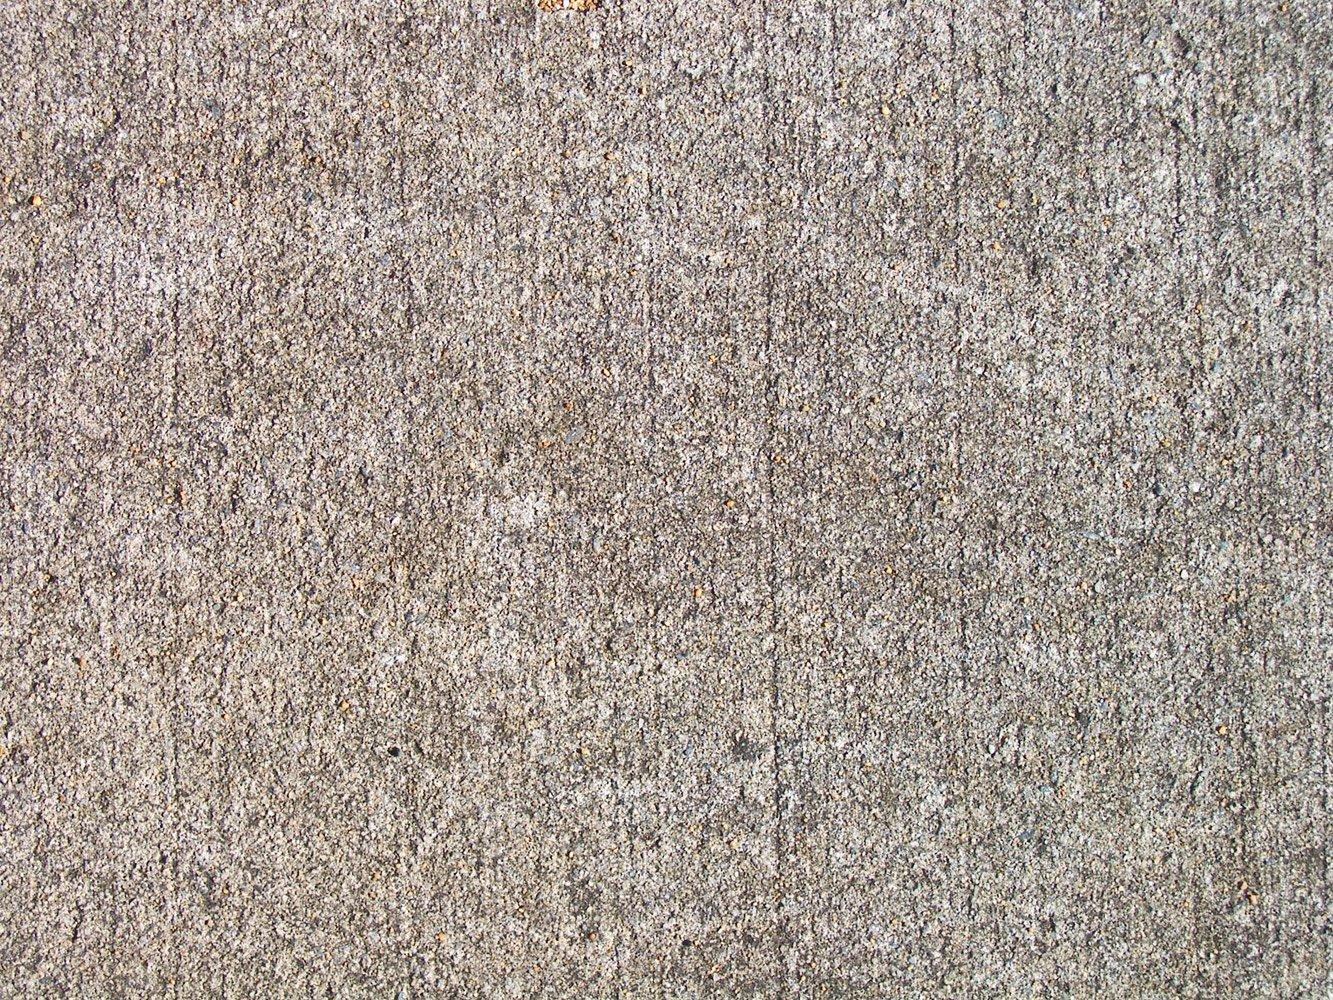 Texture cemento grezzo